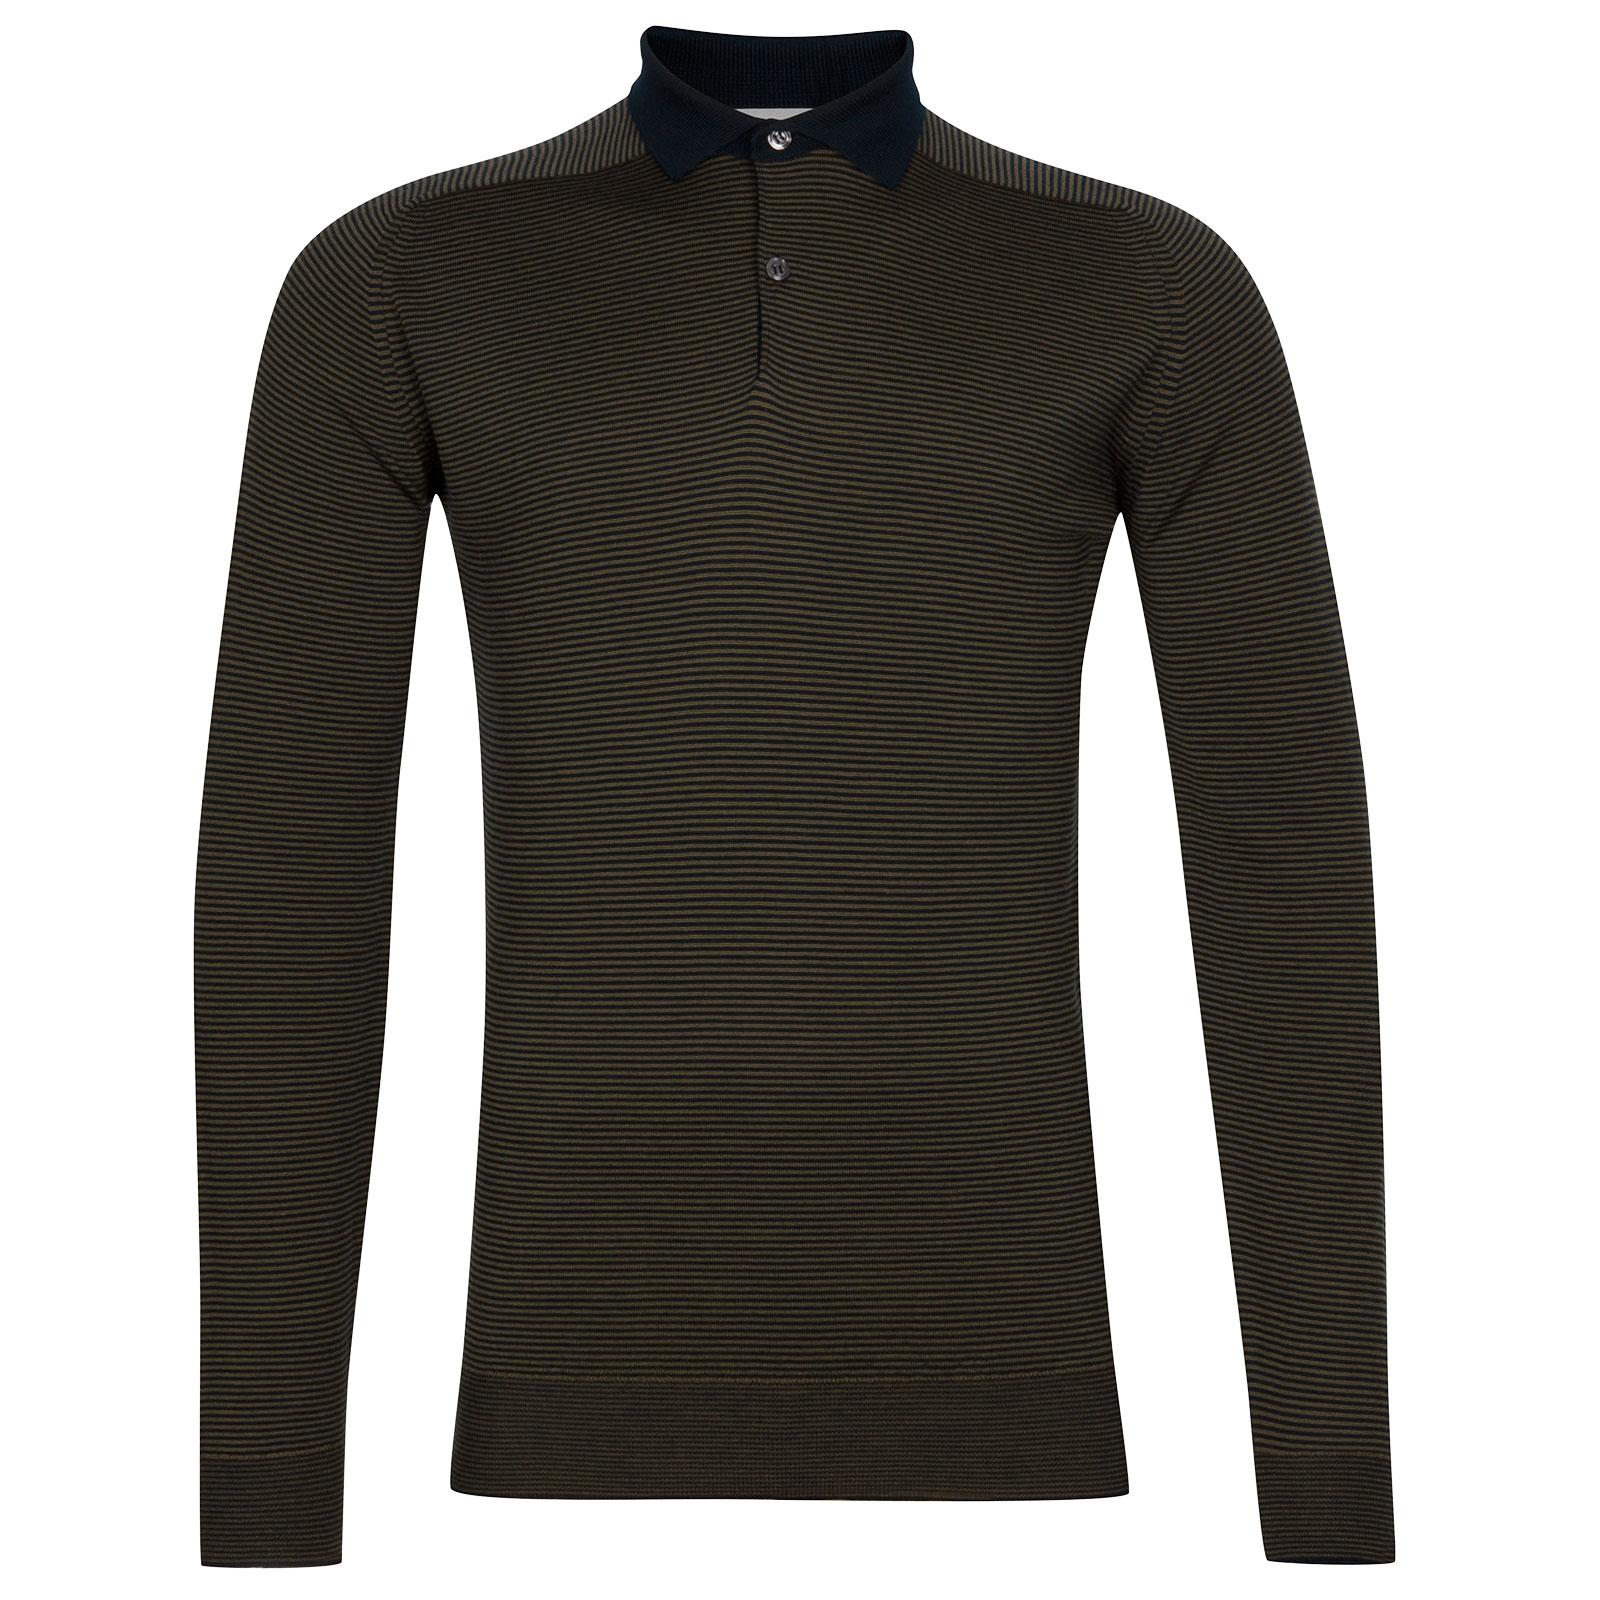 John Smedley Bunson Extra Fine Merino Shirt in Silver-XL